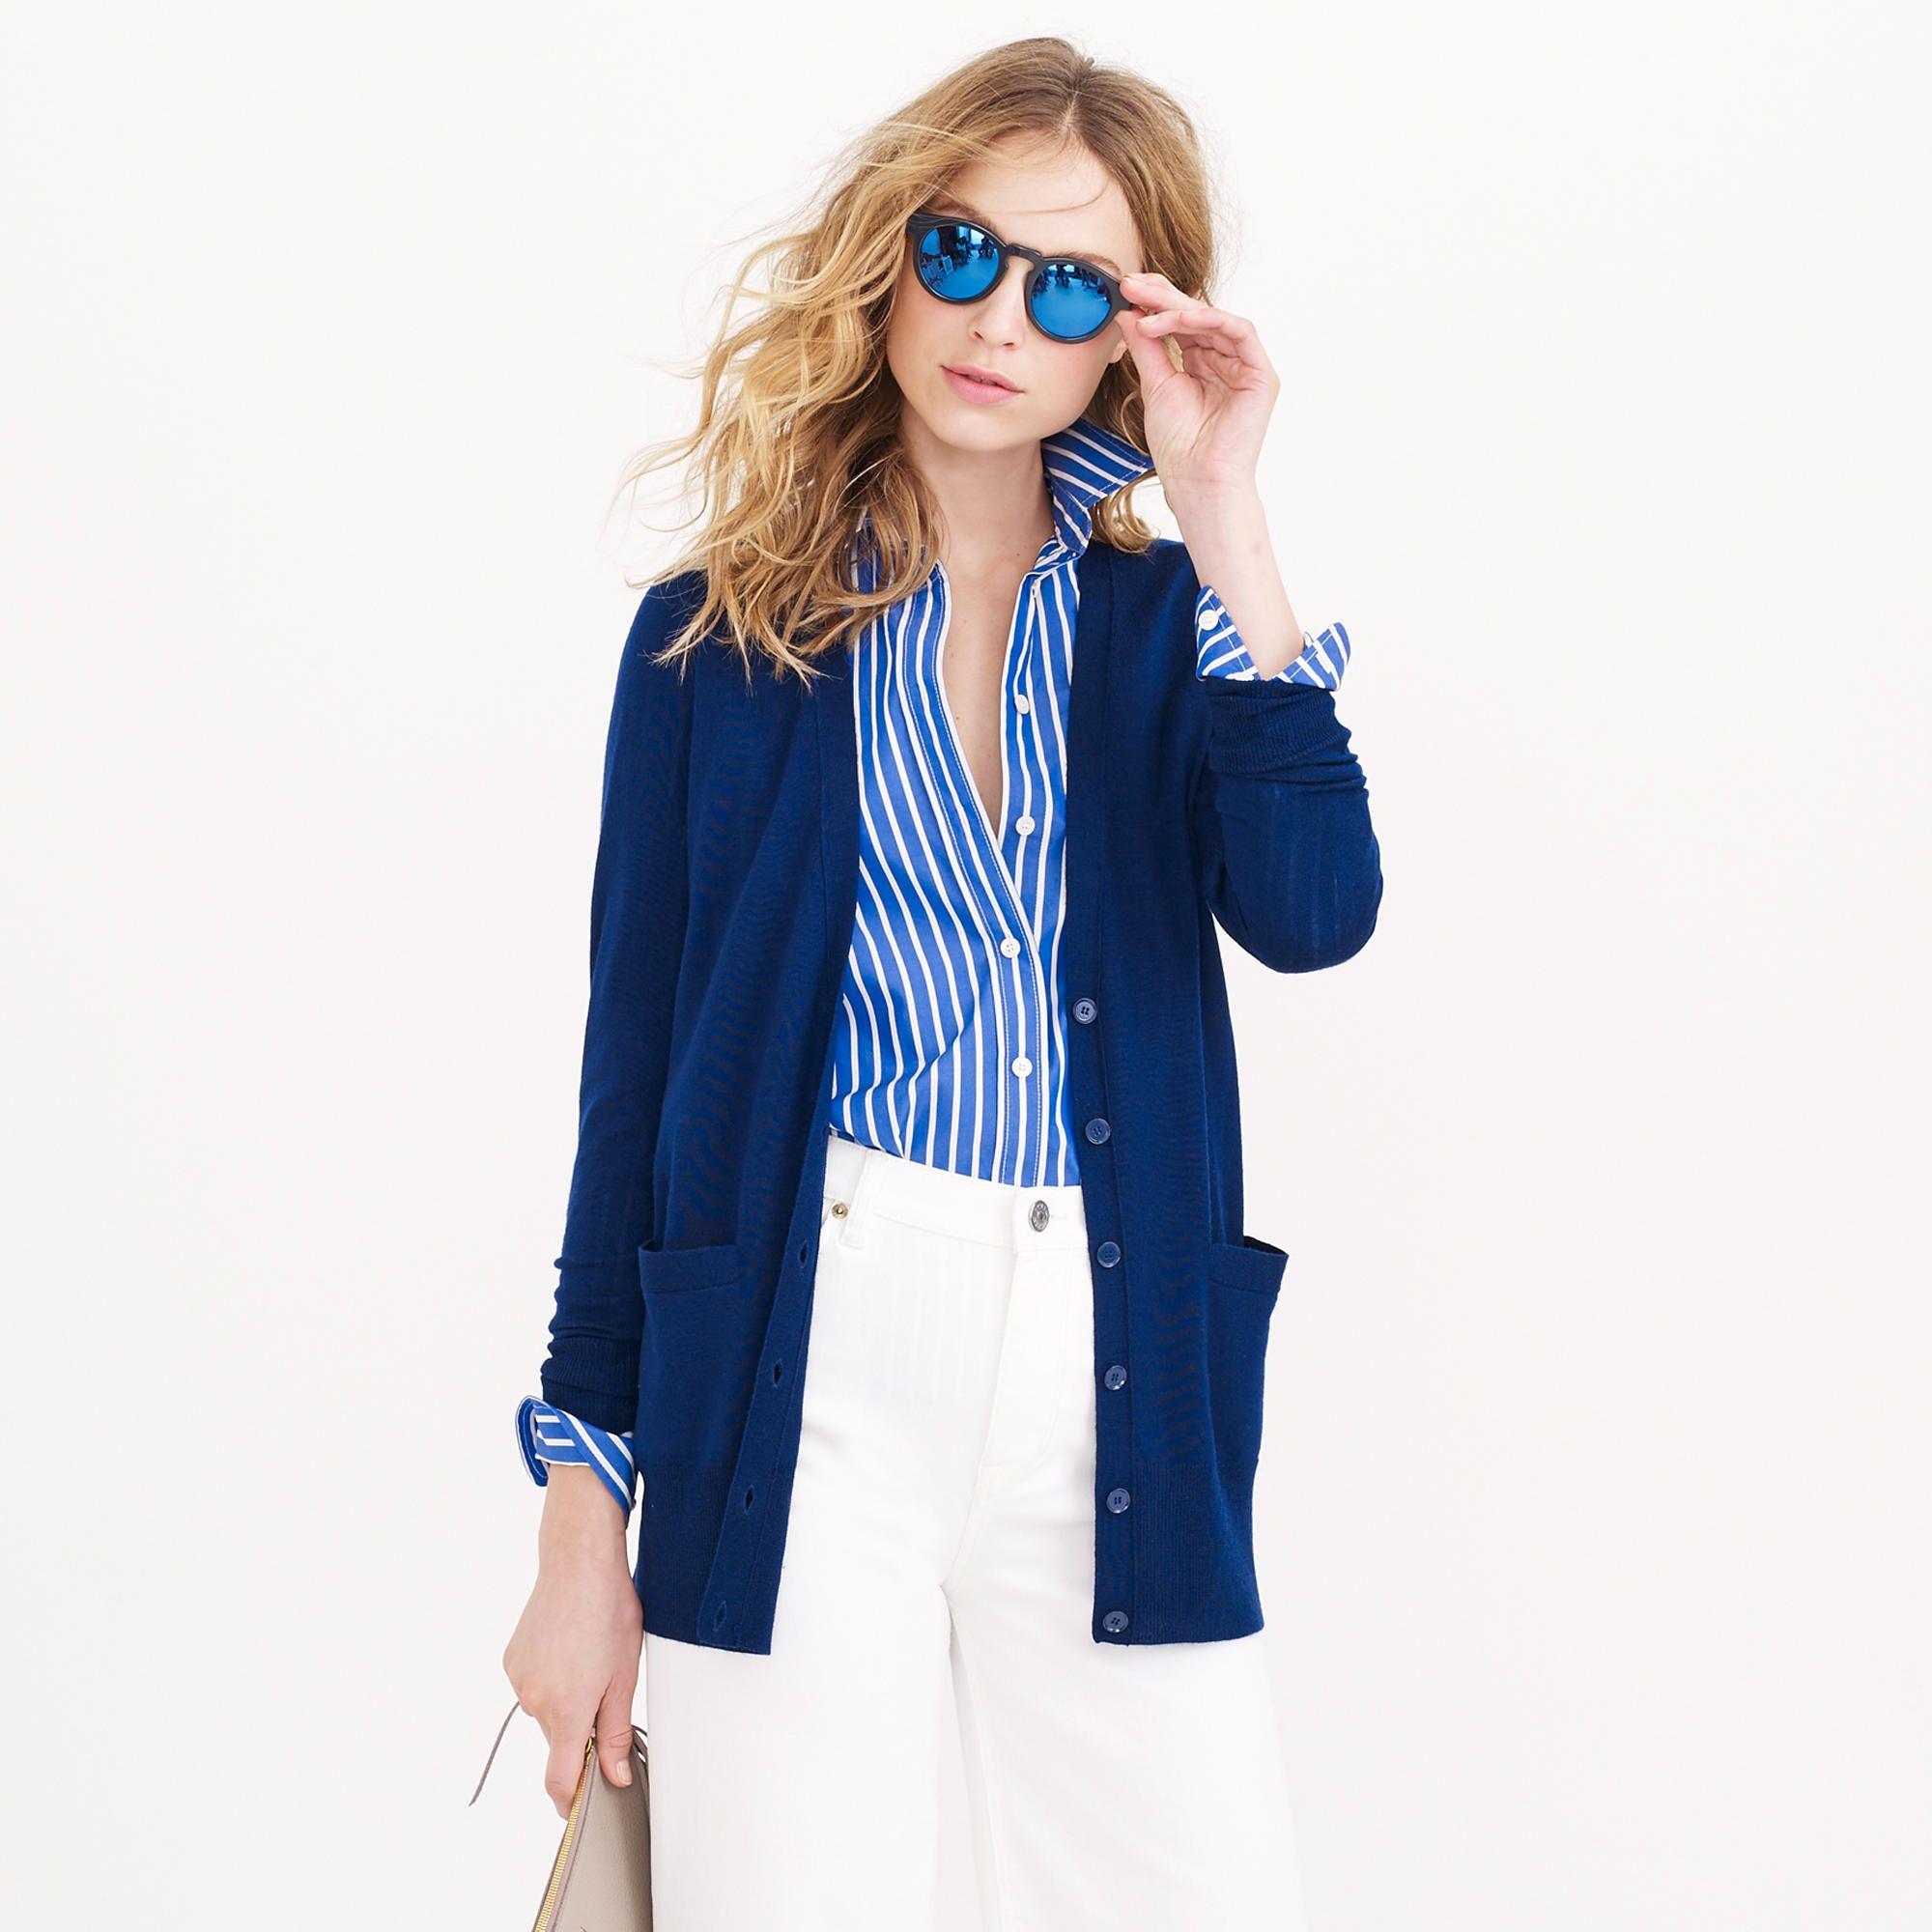 CLASSIC MERINO WOOL LONG CARDIGAN J. CREW | Style | Pinterest ...